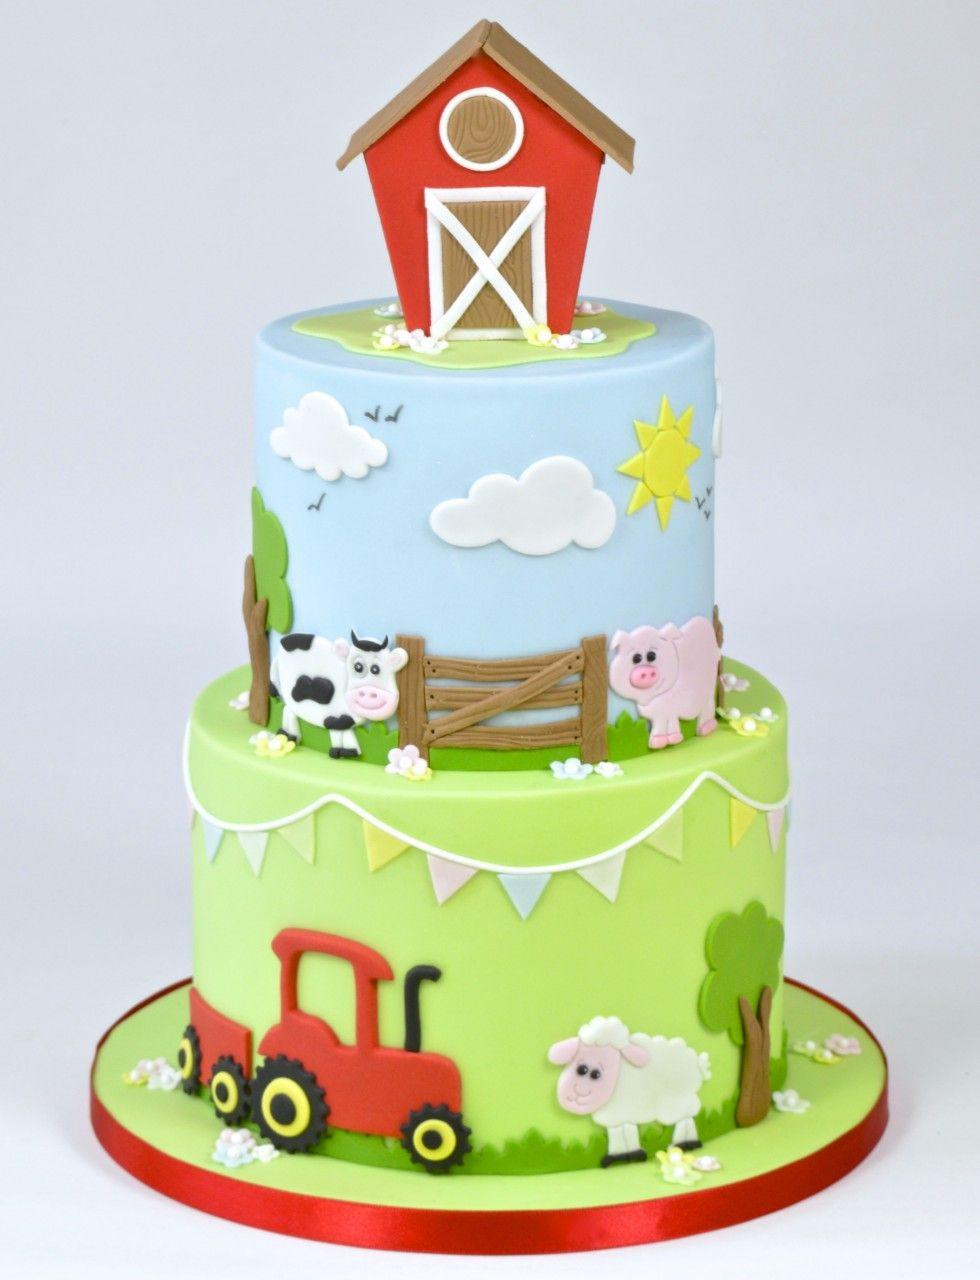 Cute Farm Animals Cutters Pasta Pinterest Farming Animal and Cake